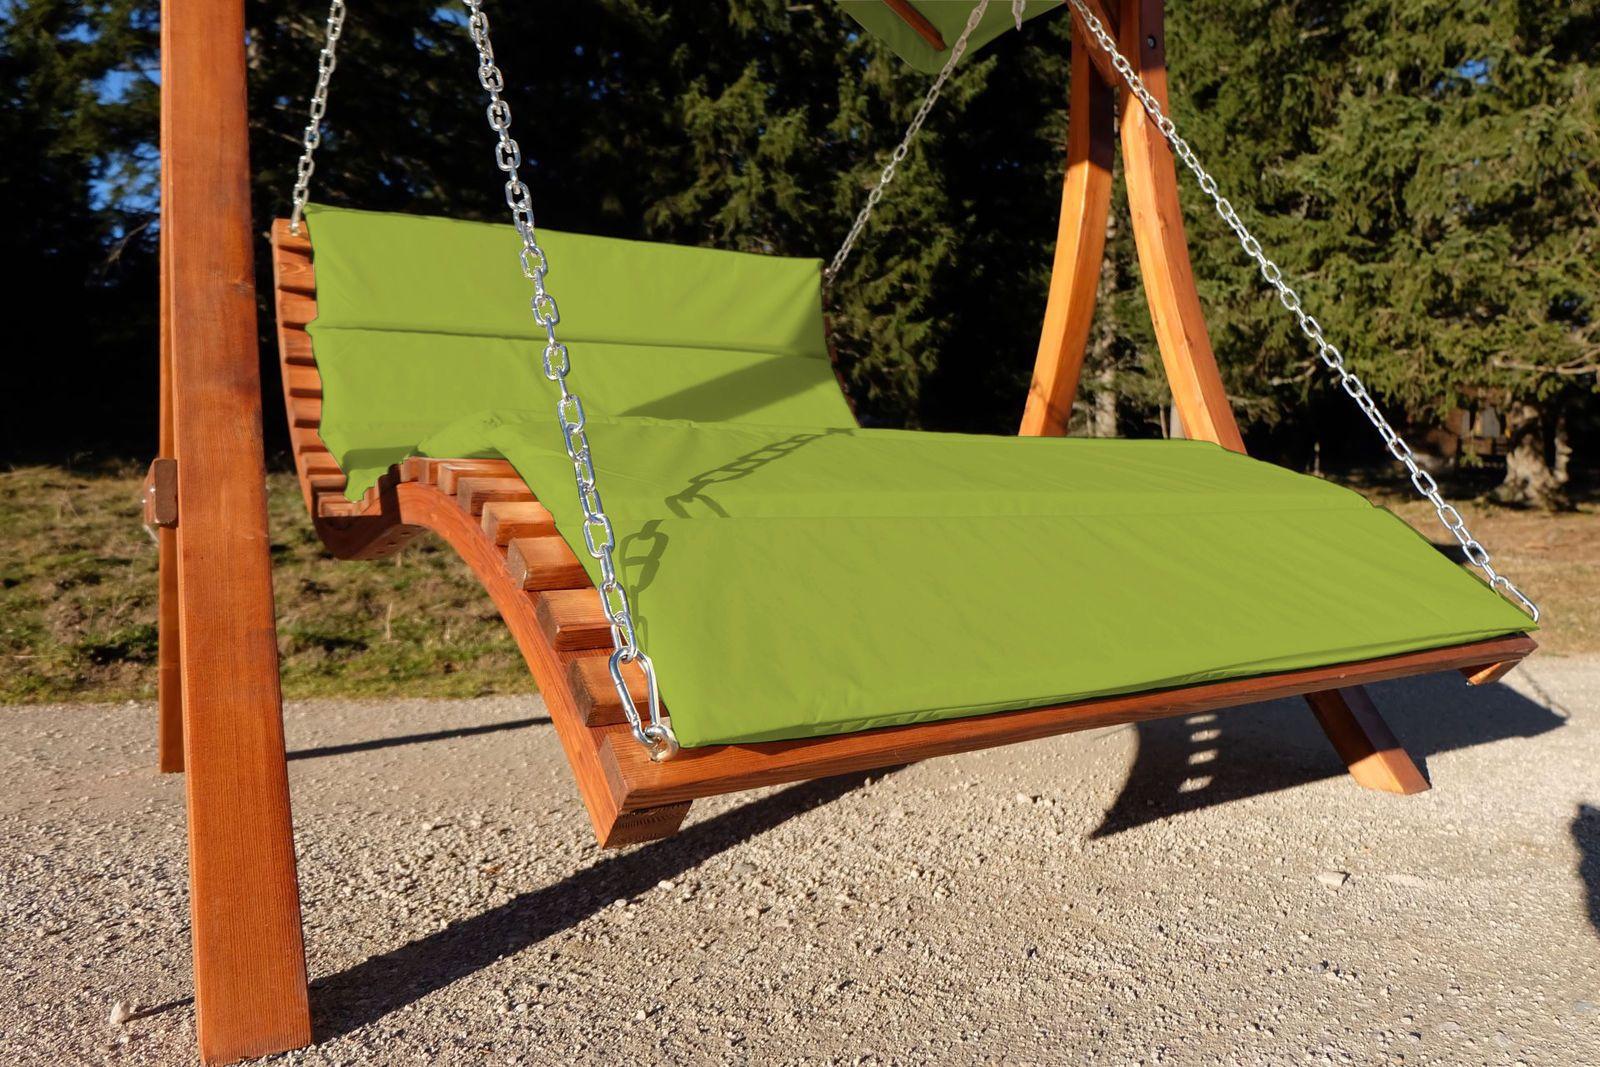 Design Hollywoodliege Gartenliege Hangeliege Doppelliege Modell Aruba Loung Grun Ebay Gartenliege Doppelliege Gruner Garten